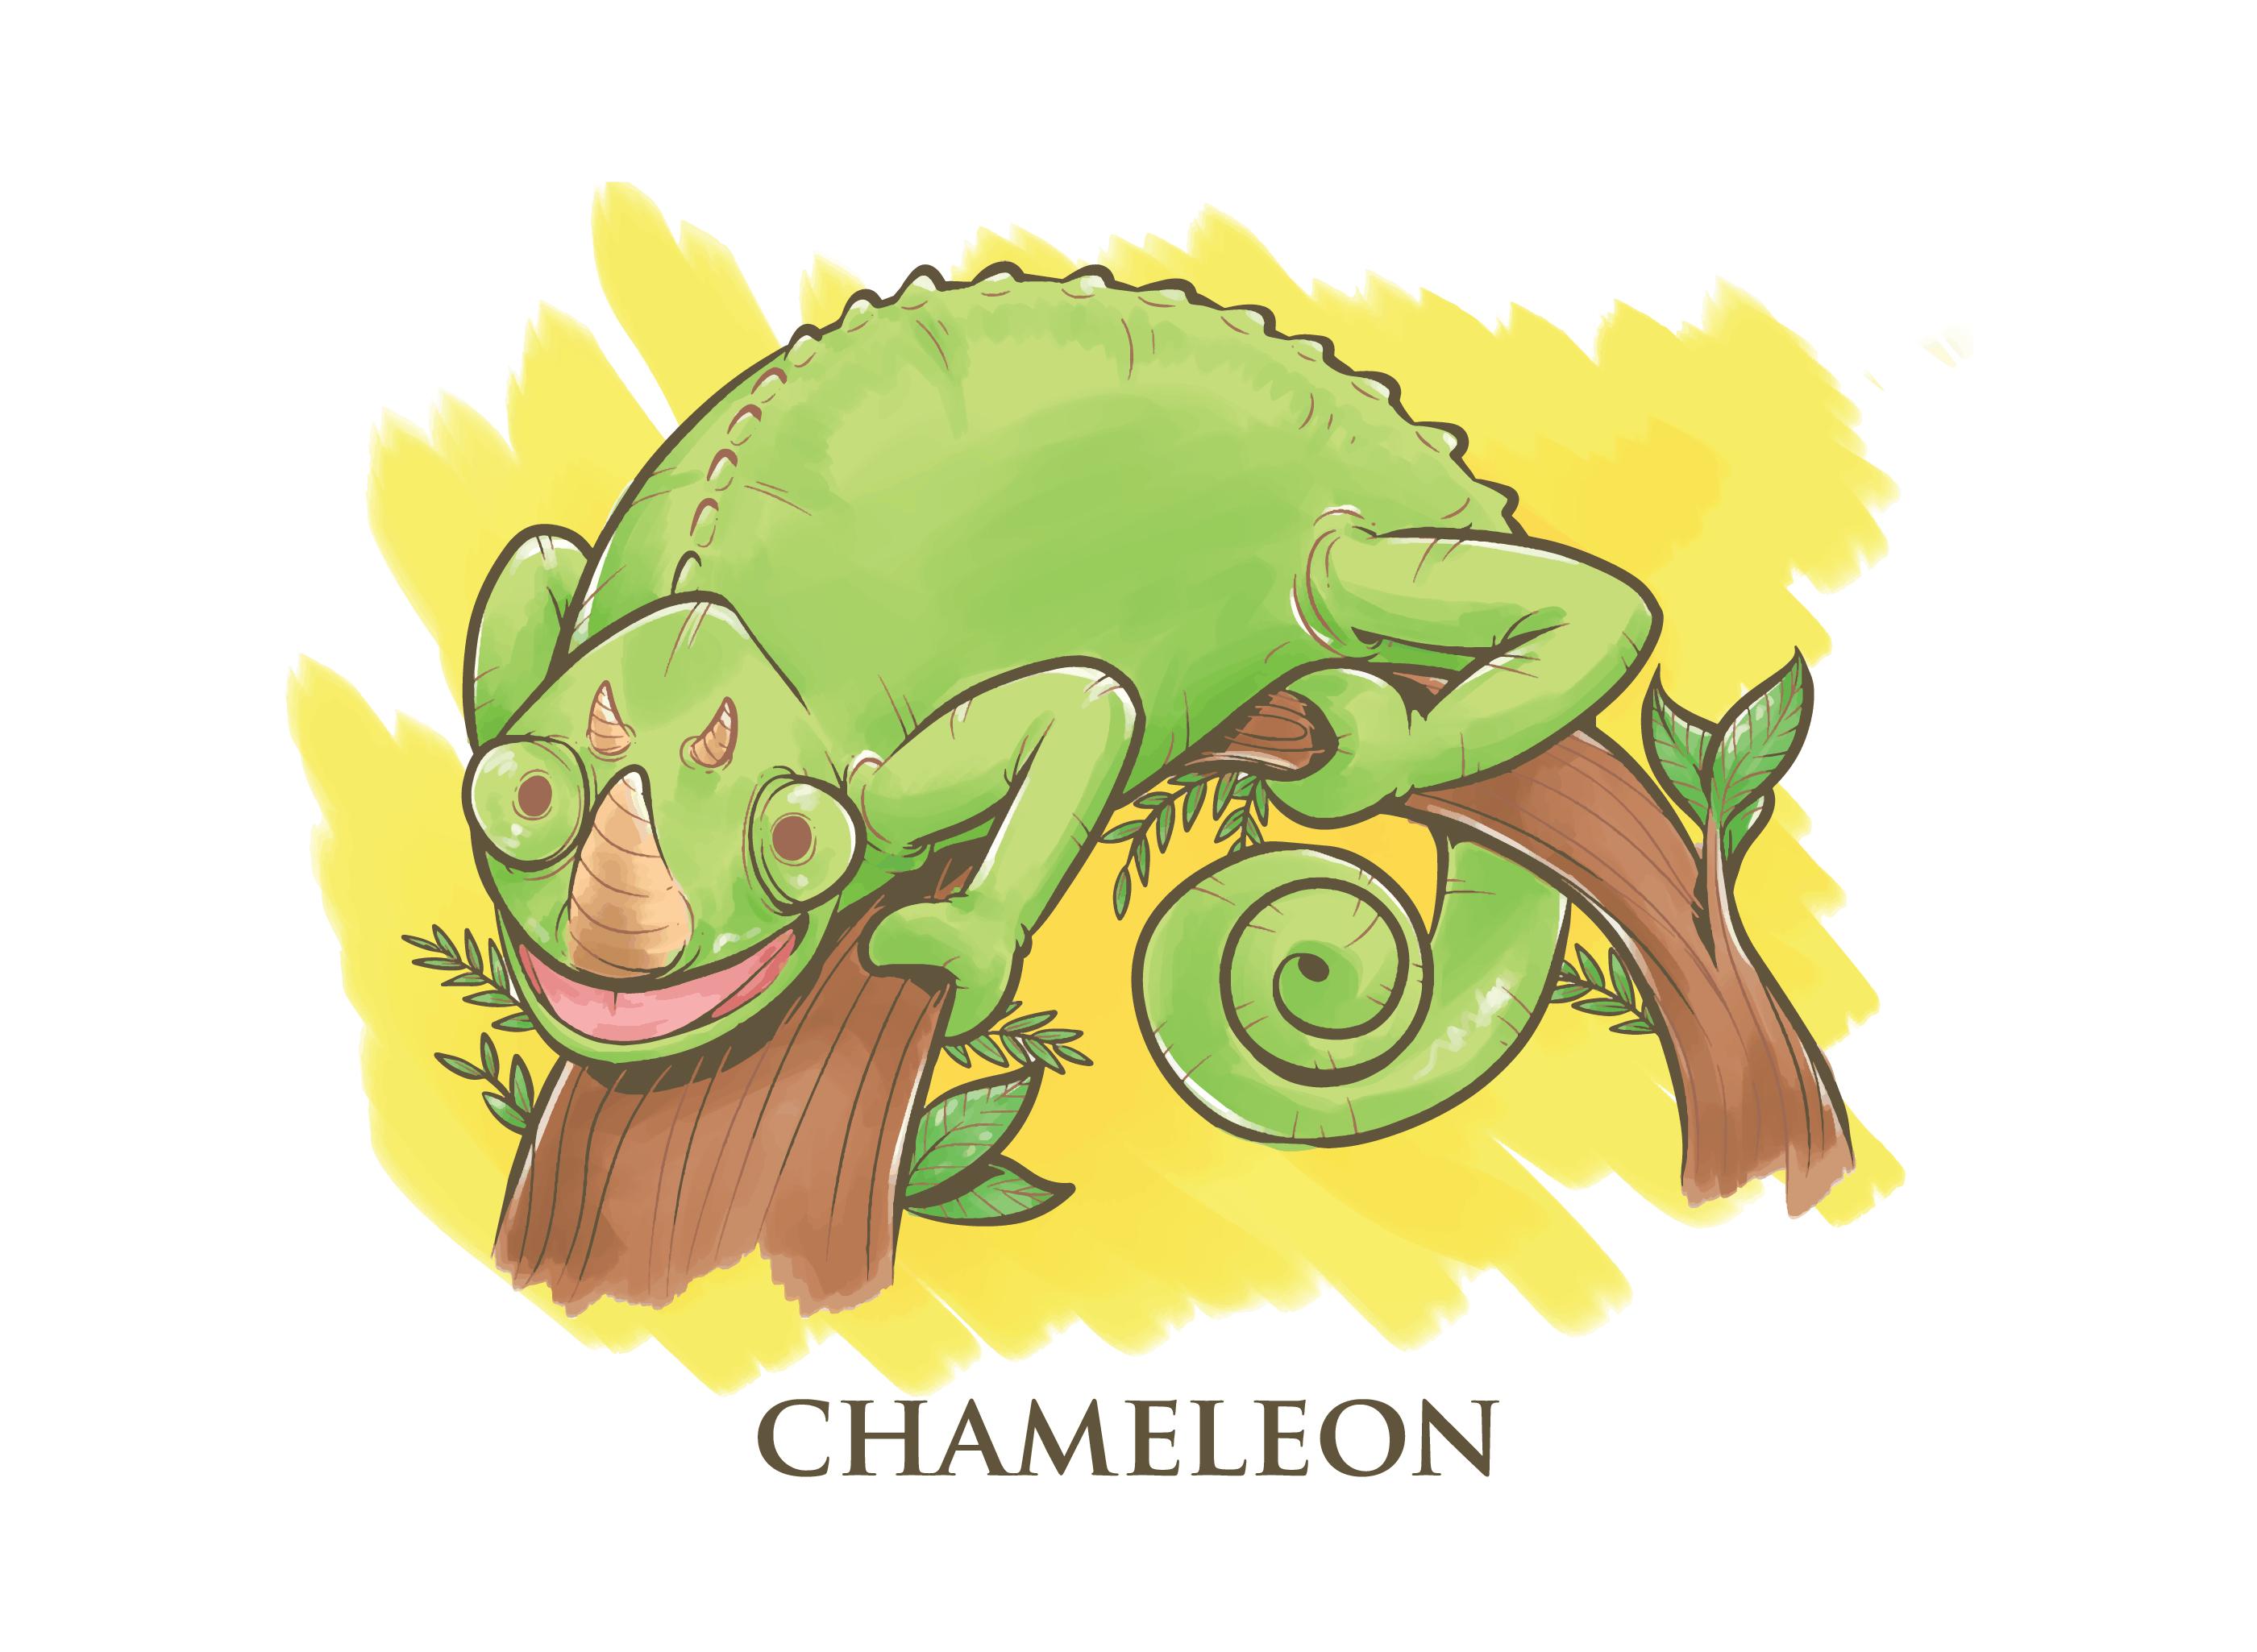 Vector Illustration Web Designs: Chameleon Cartoon Illustration